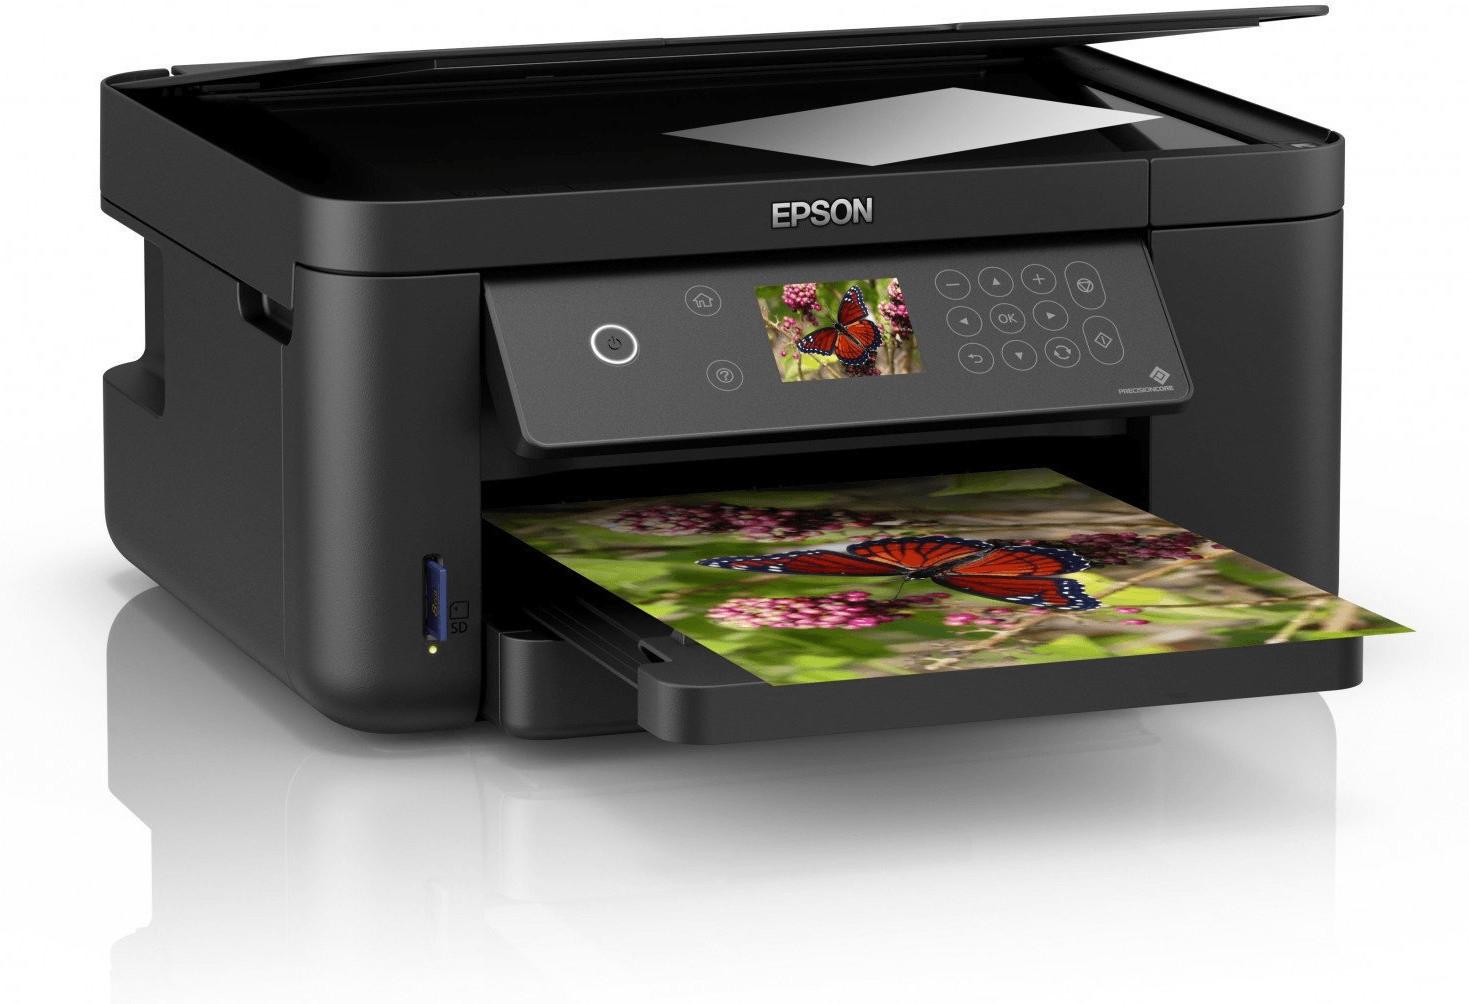 Tintenstrahl-MFD Epson Expression Home XP-5105 (Drucker/Scanner/Kopierer, A4, 14/7.5 S/min, 170 Blatt, Duplexdruck, WLAN, USB, Display)